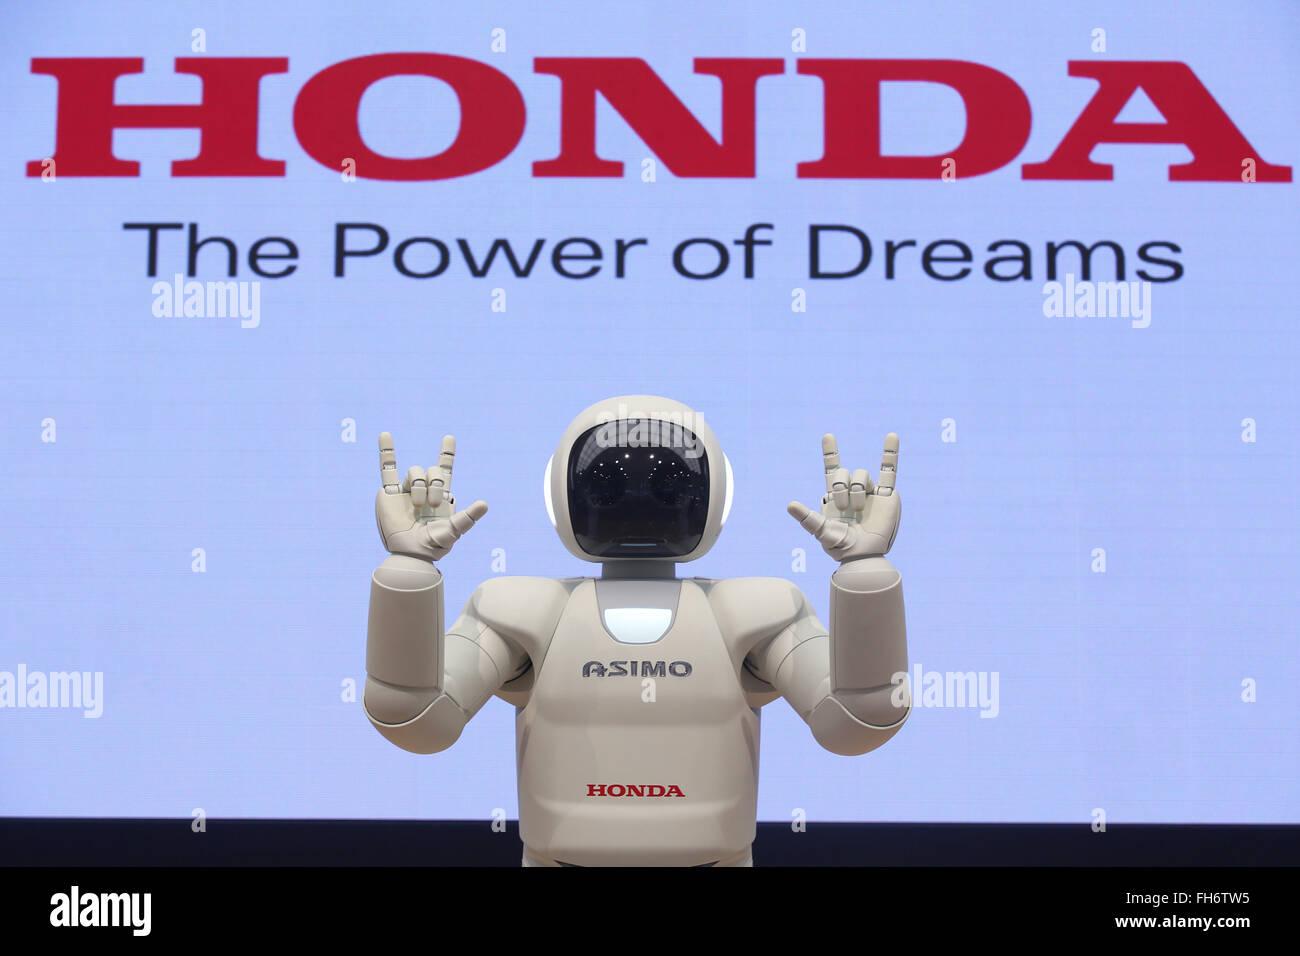 Honda Motor Cos Humanoid Robot ASIMO Demonstrates At The Companys Showroom In Tokyo Japan February 24 2016 Credit Aflo Co Ltd Alamy Live News